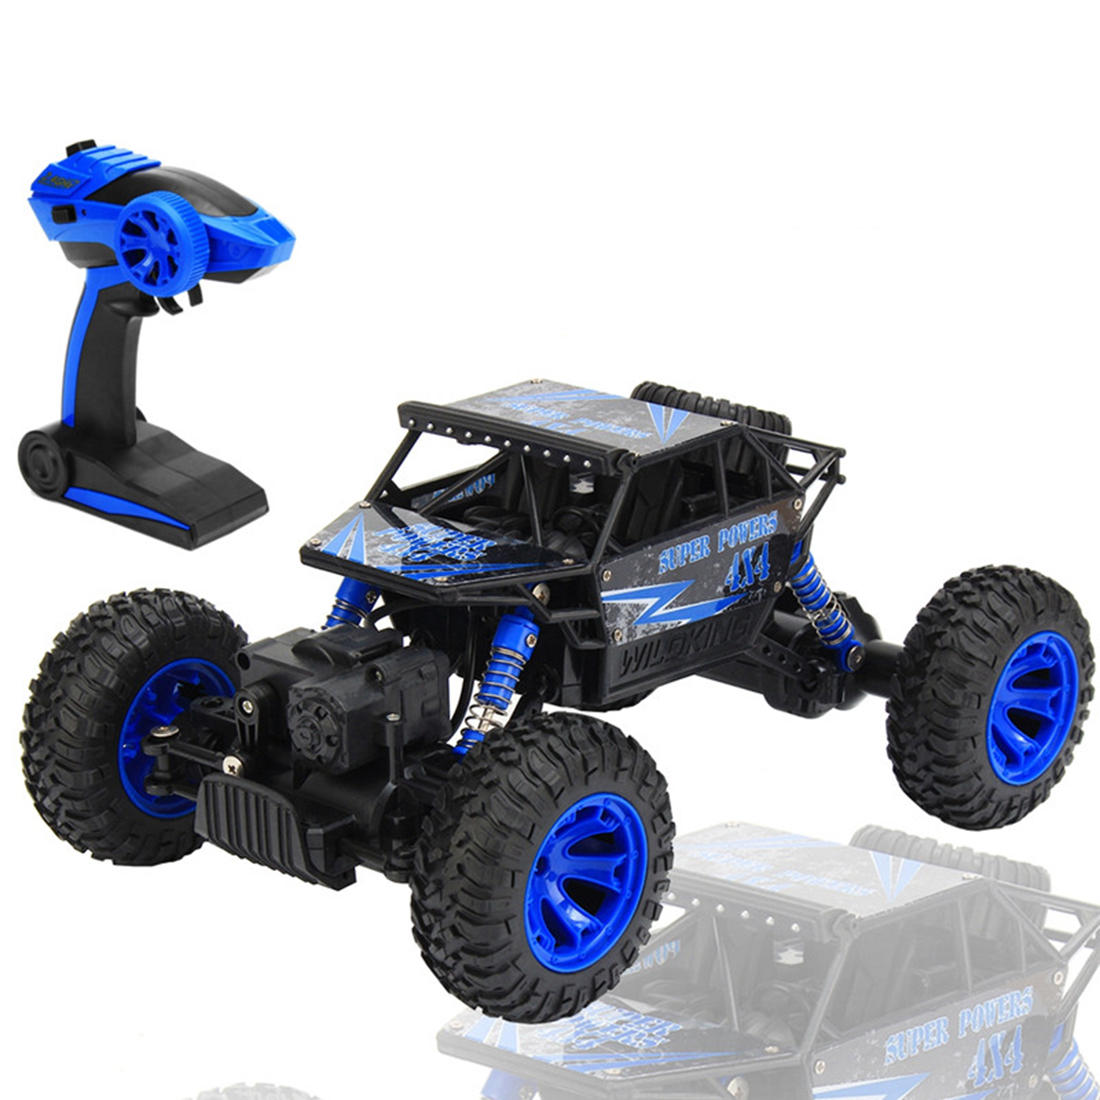 2.4GHz 1:18 Scale 4x4 Rock Crawlers Car RC Rock Crawler